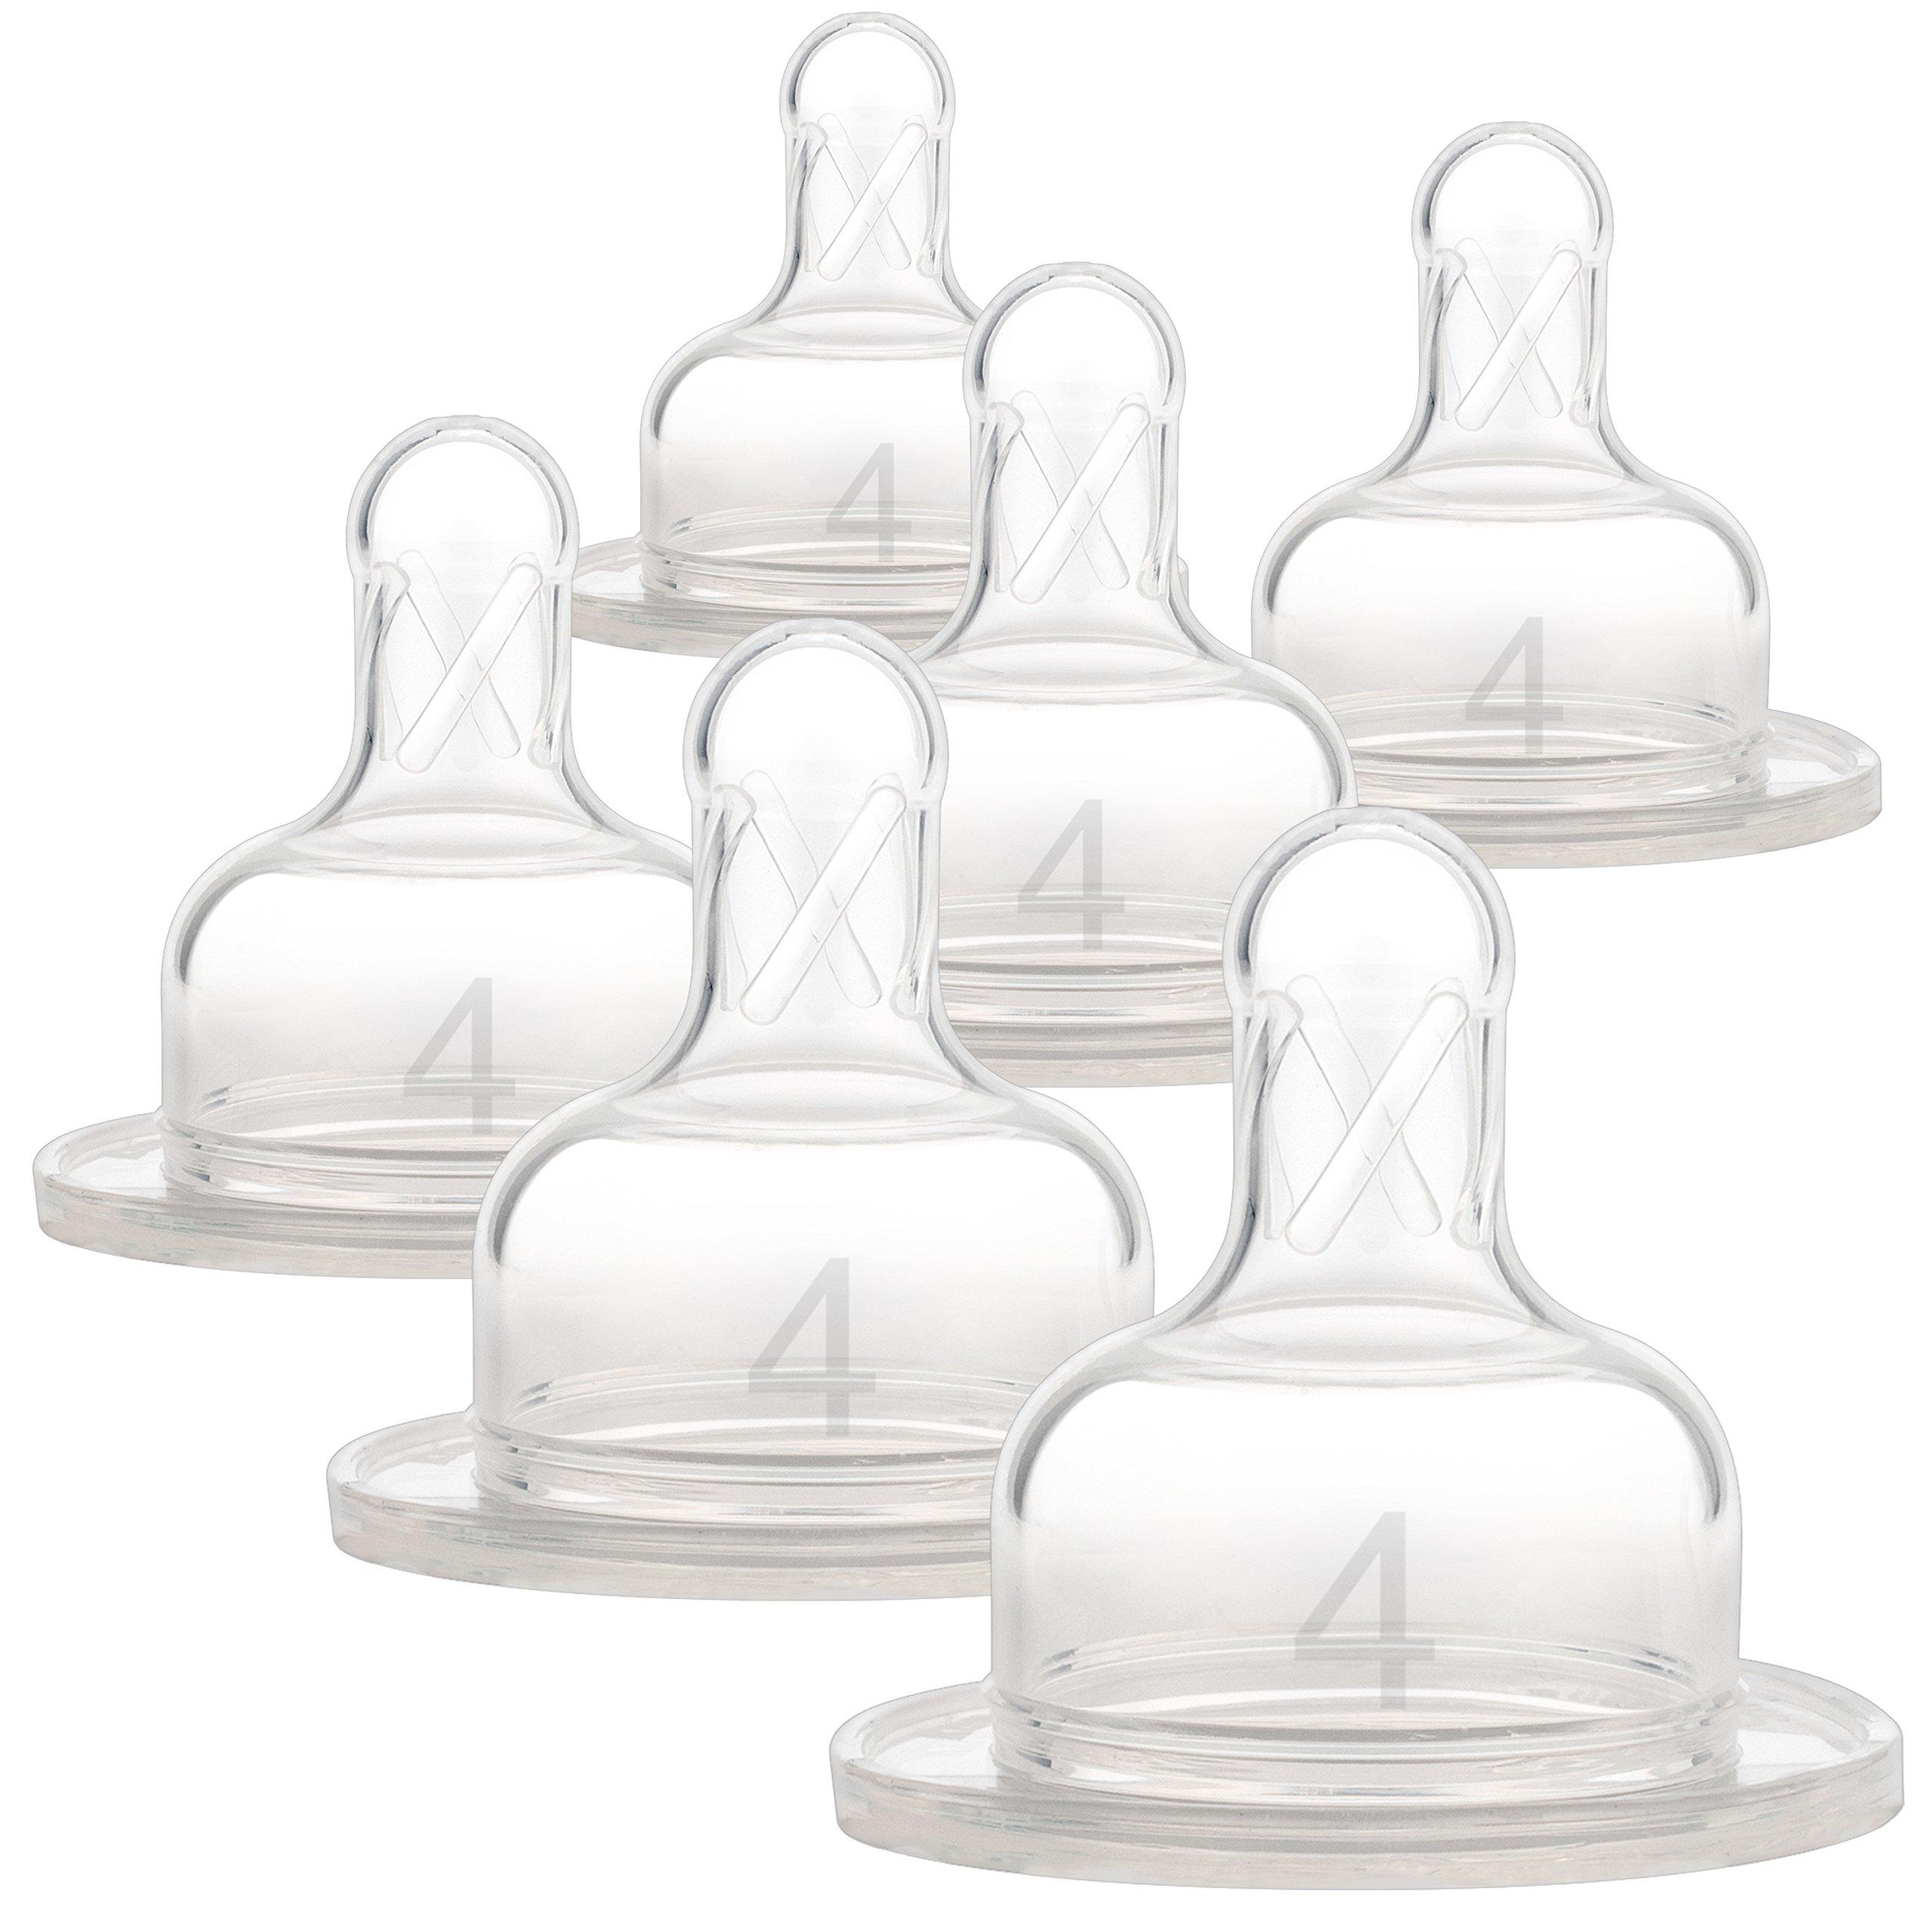 Dr. Brown's Original Wide-Neck Nipple, Level 4 (9m+), 6-pack